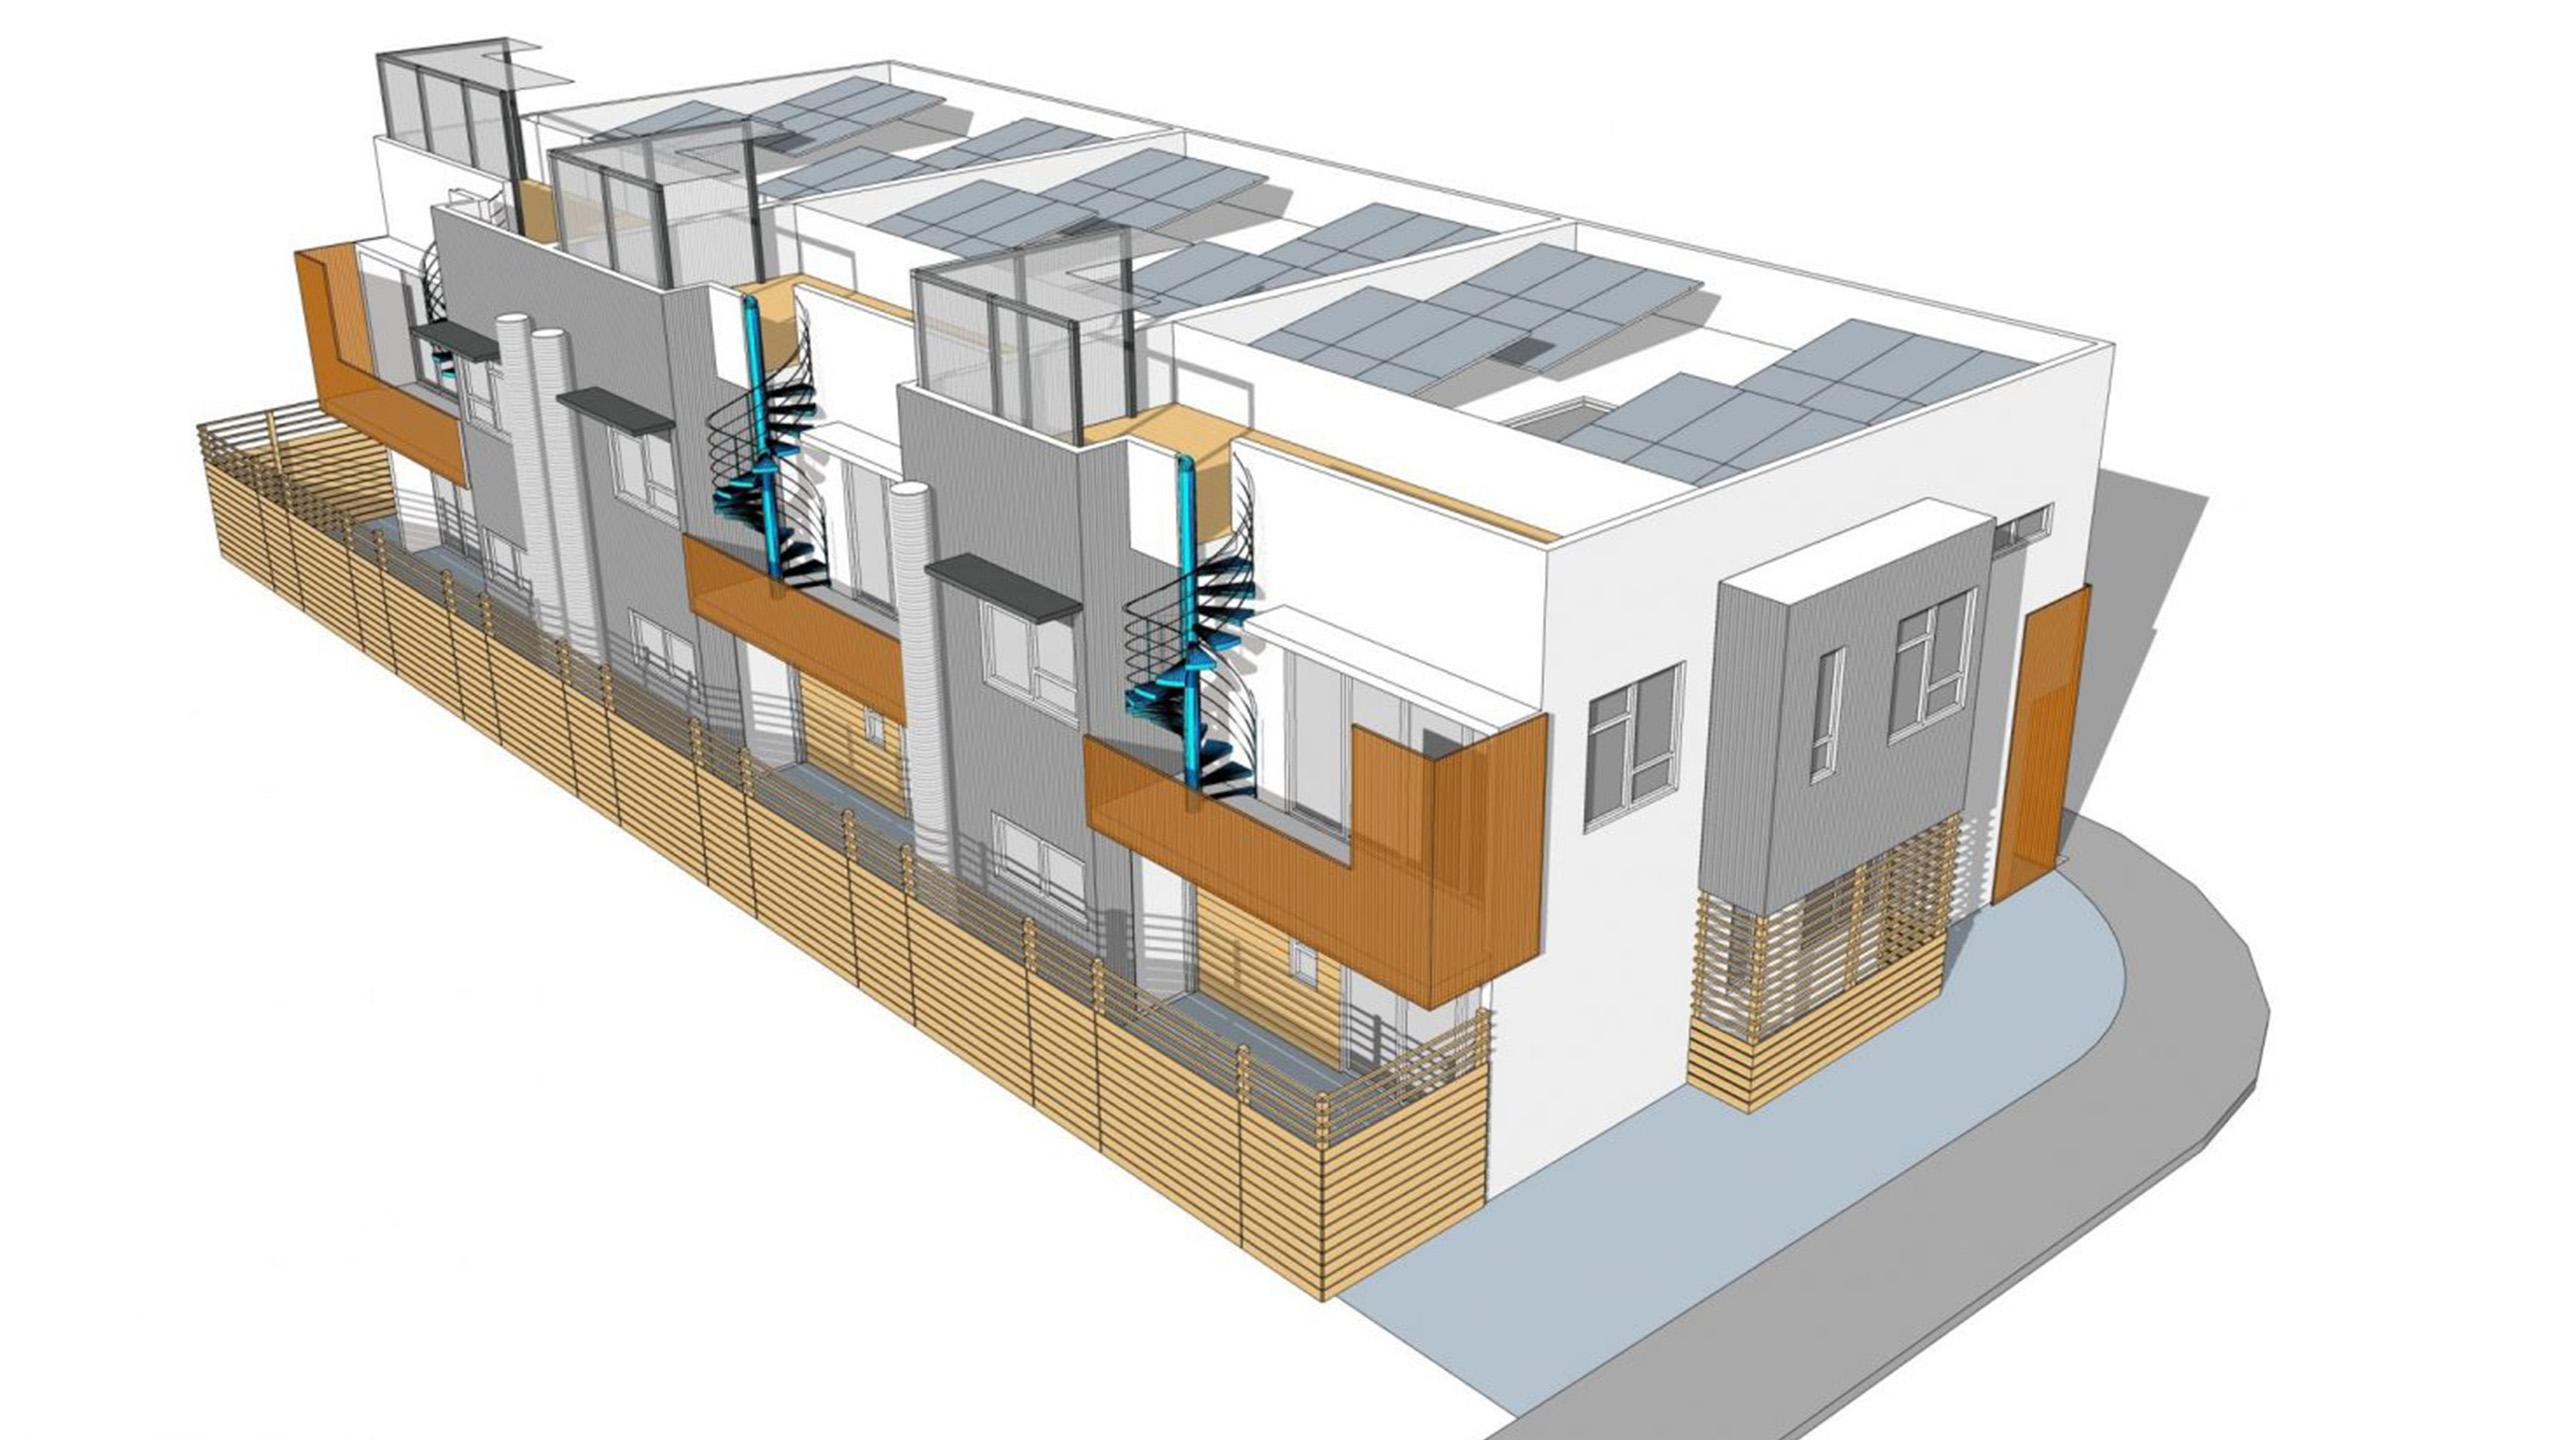 Cherry Suites Multifamily Petaluma sustainable architecture 2